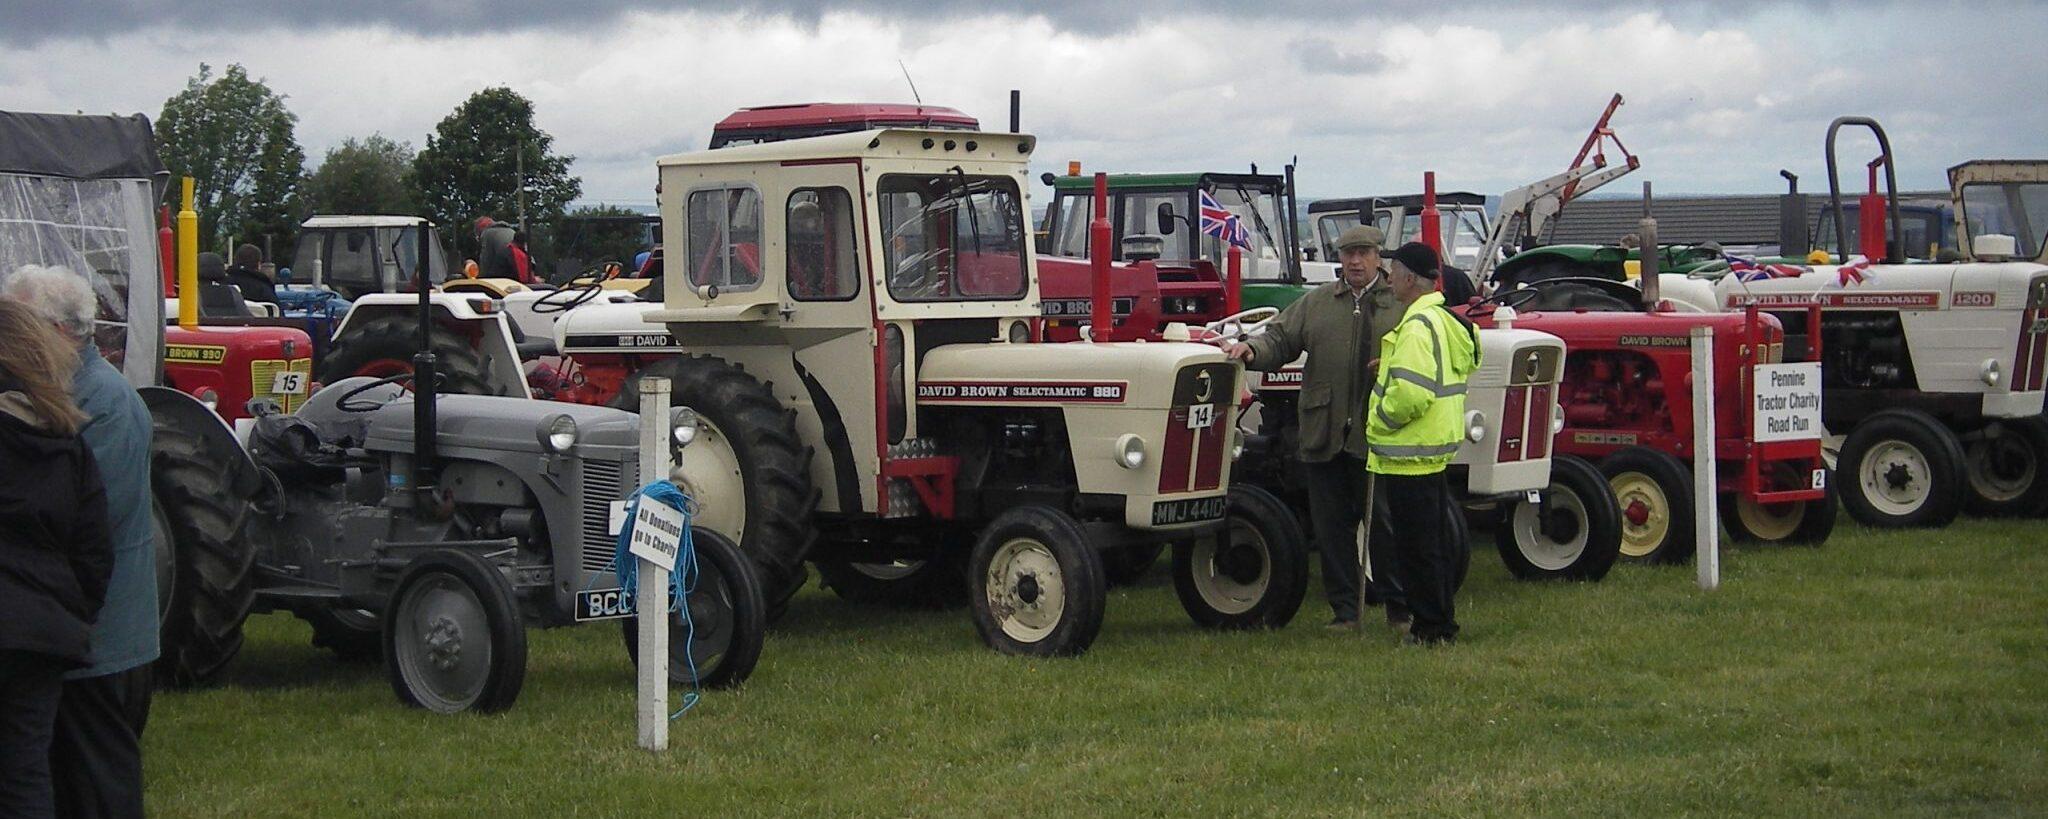 SPARC Calls For New Rural Enterprise Zone